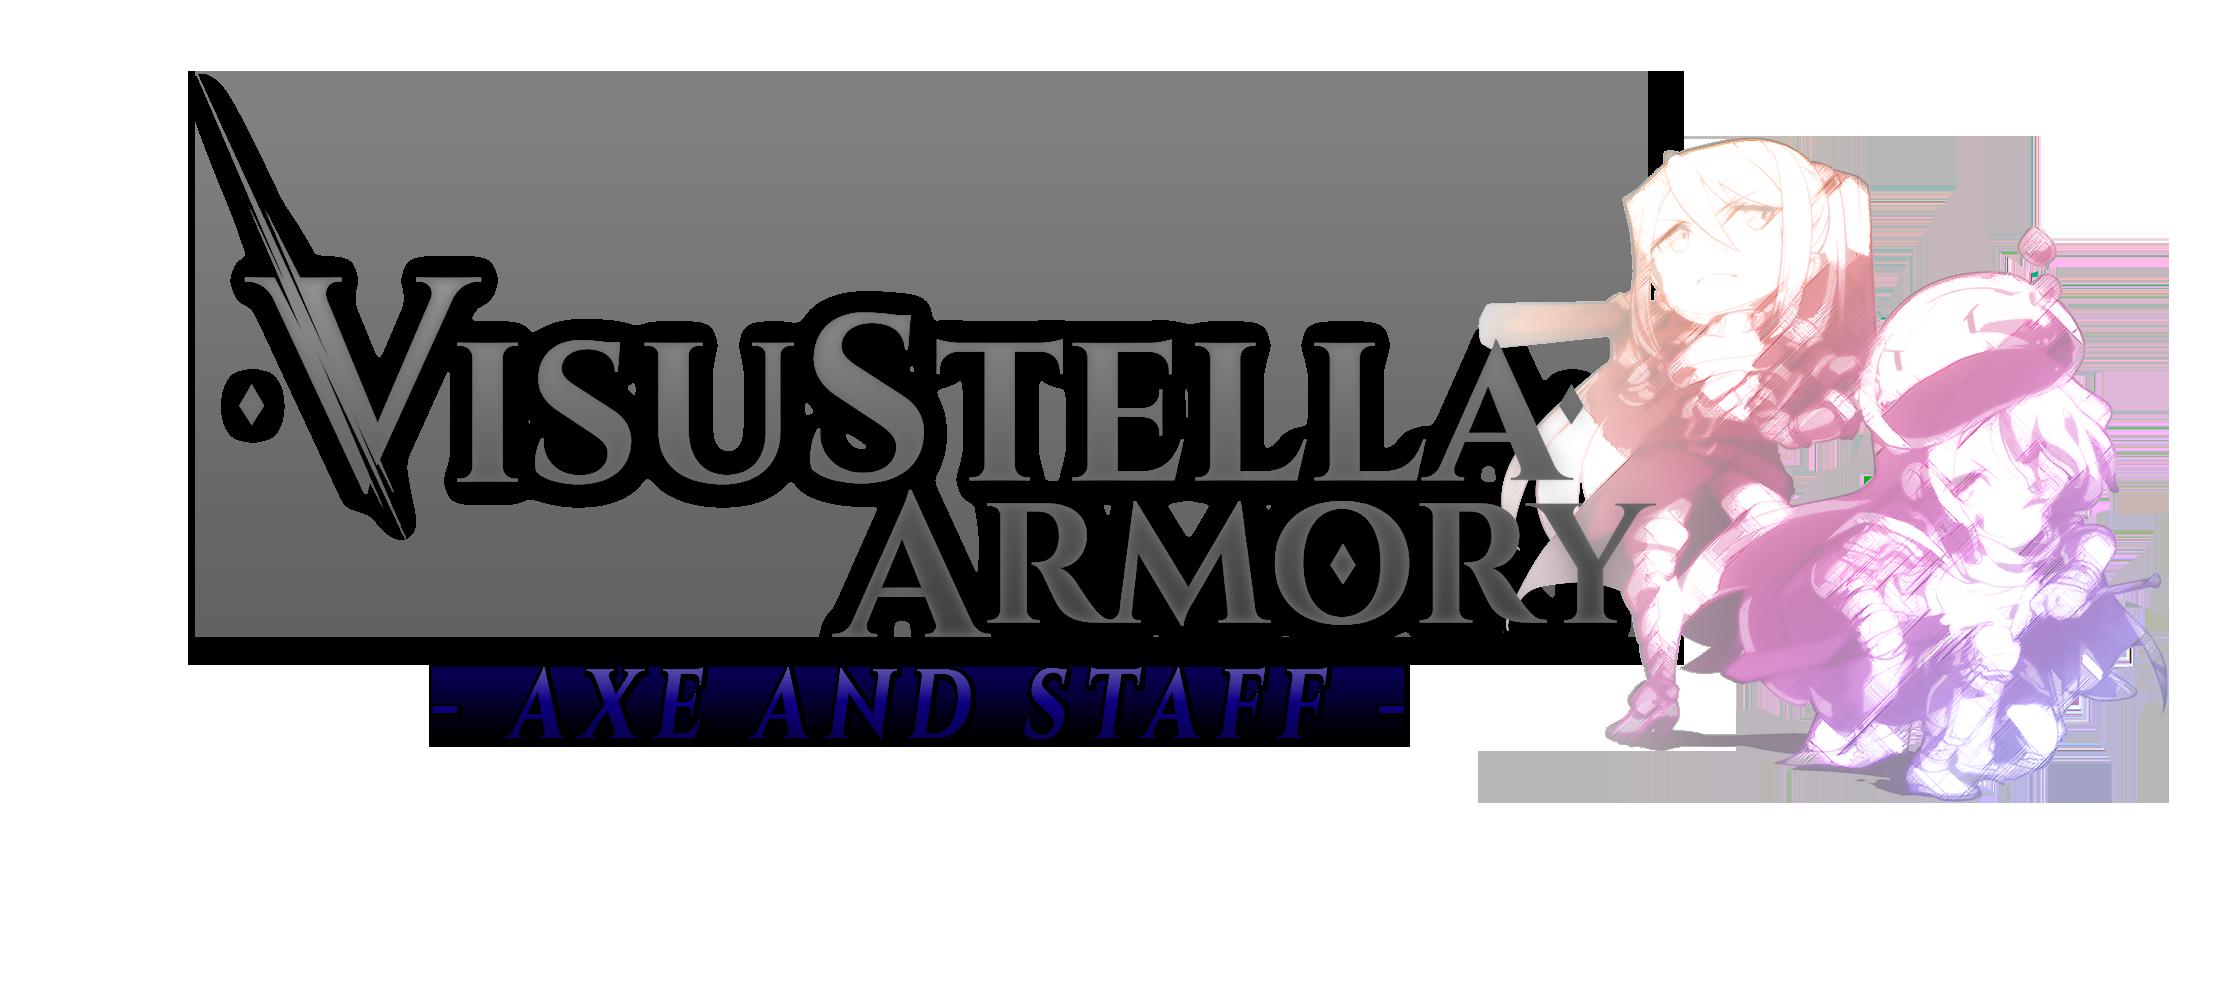 VisuStella Armory - Axe and Staff